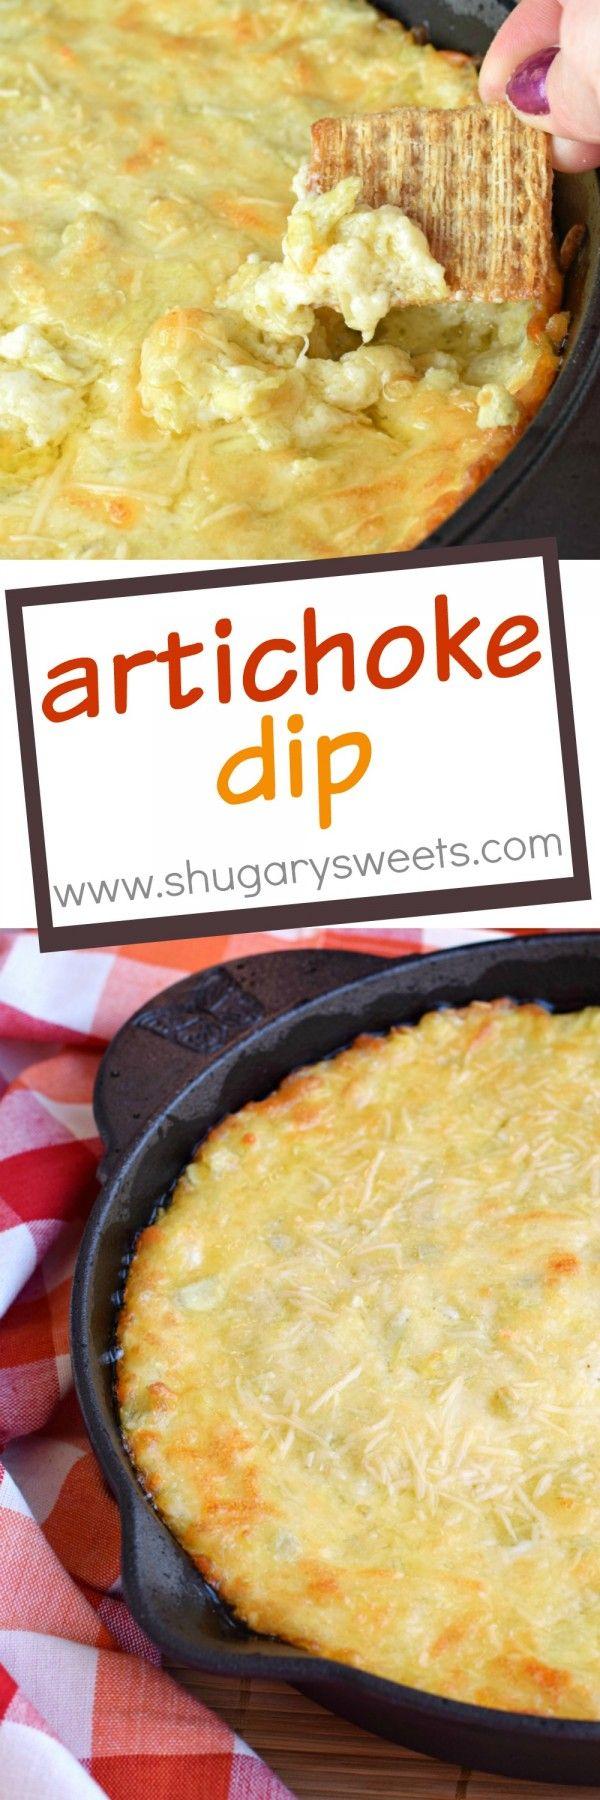 Artichoke Dip - Shugary Sweets